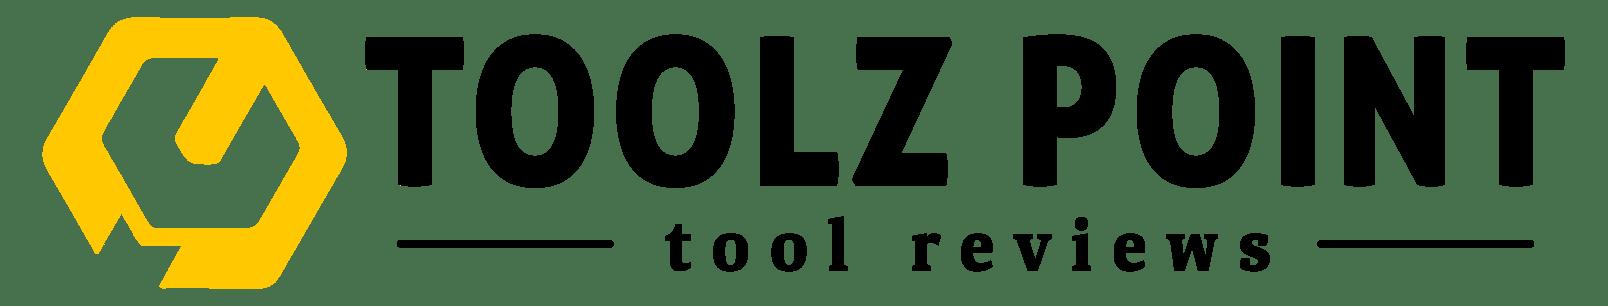 Toolz Point logo